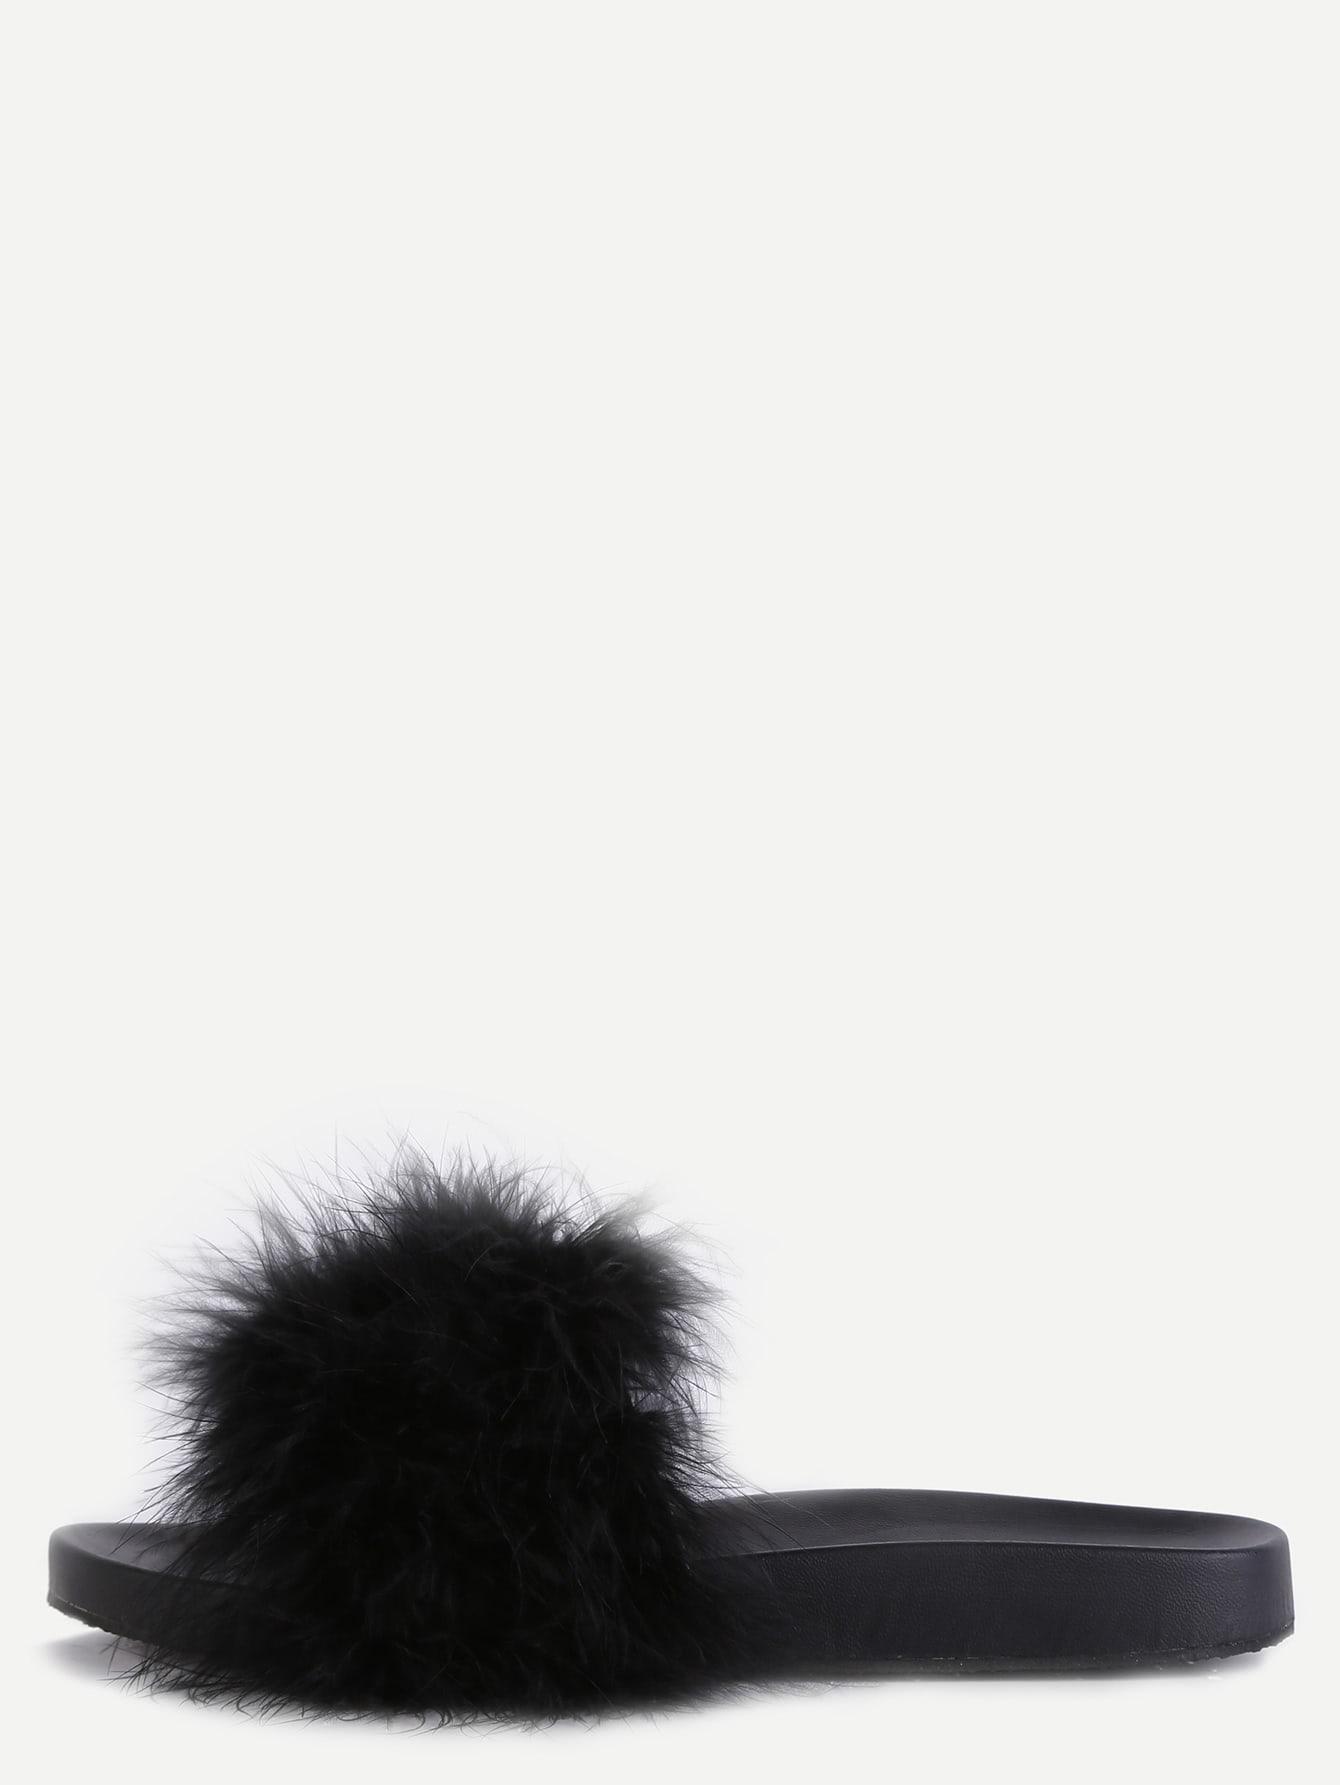 Black Faux Leather Rubber Peep Toe Flip Flops Fur Lined Casual Cute Sandals.